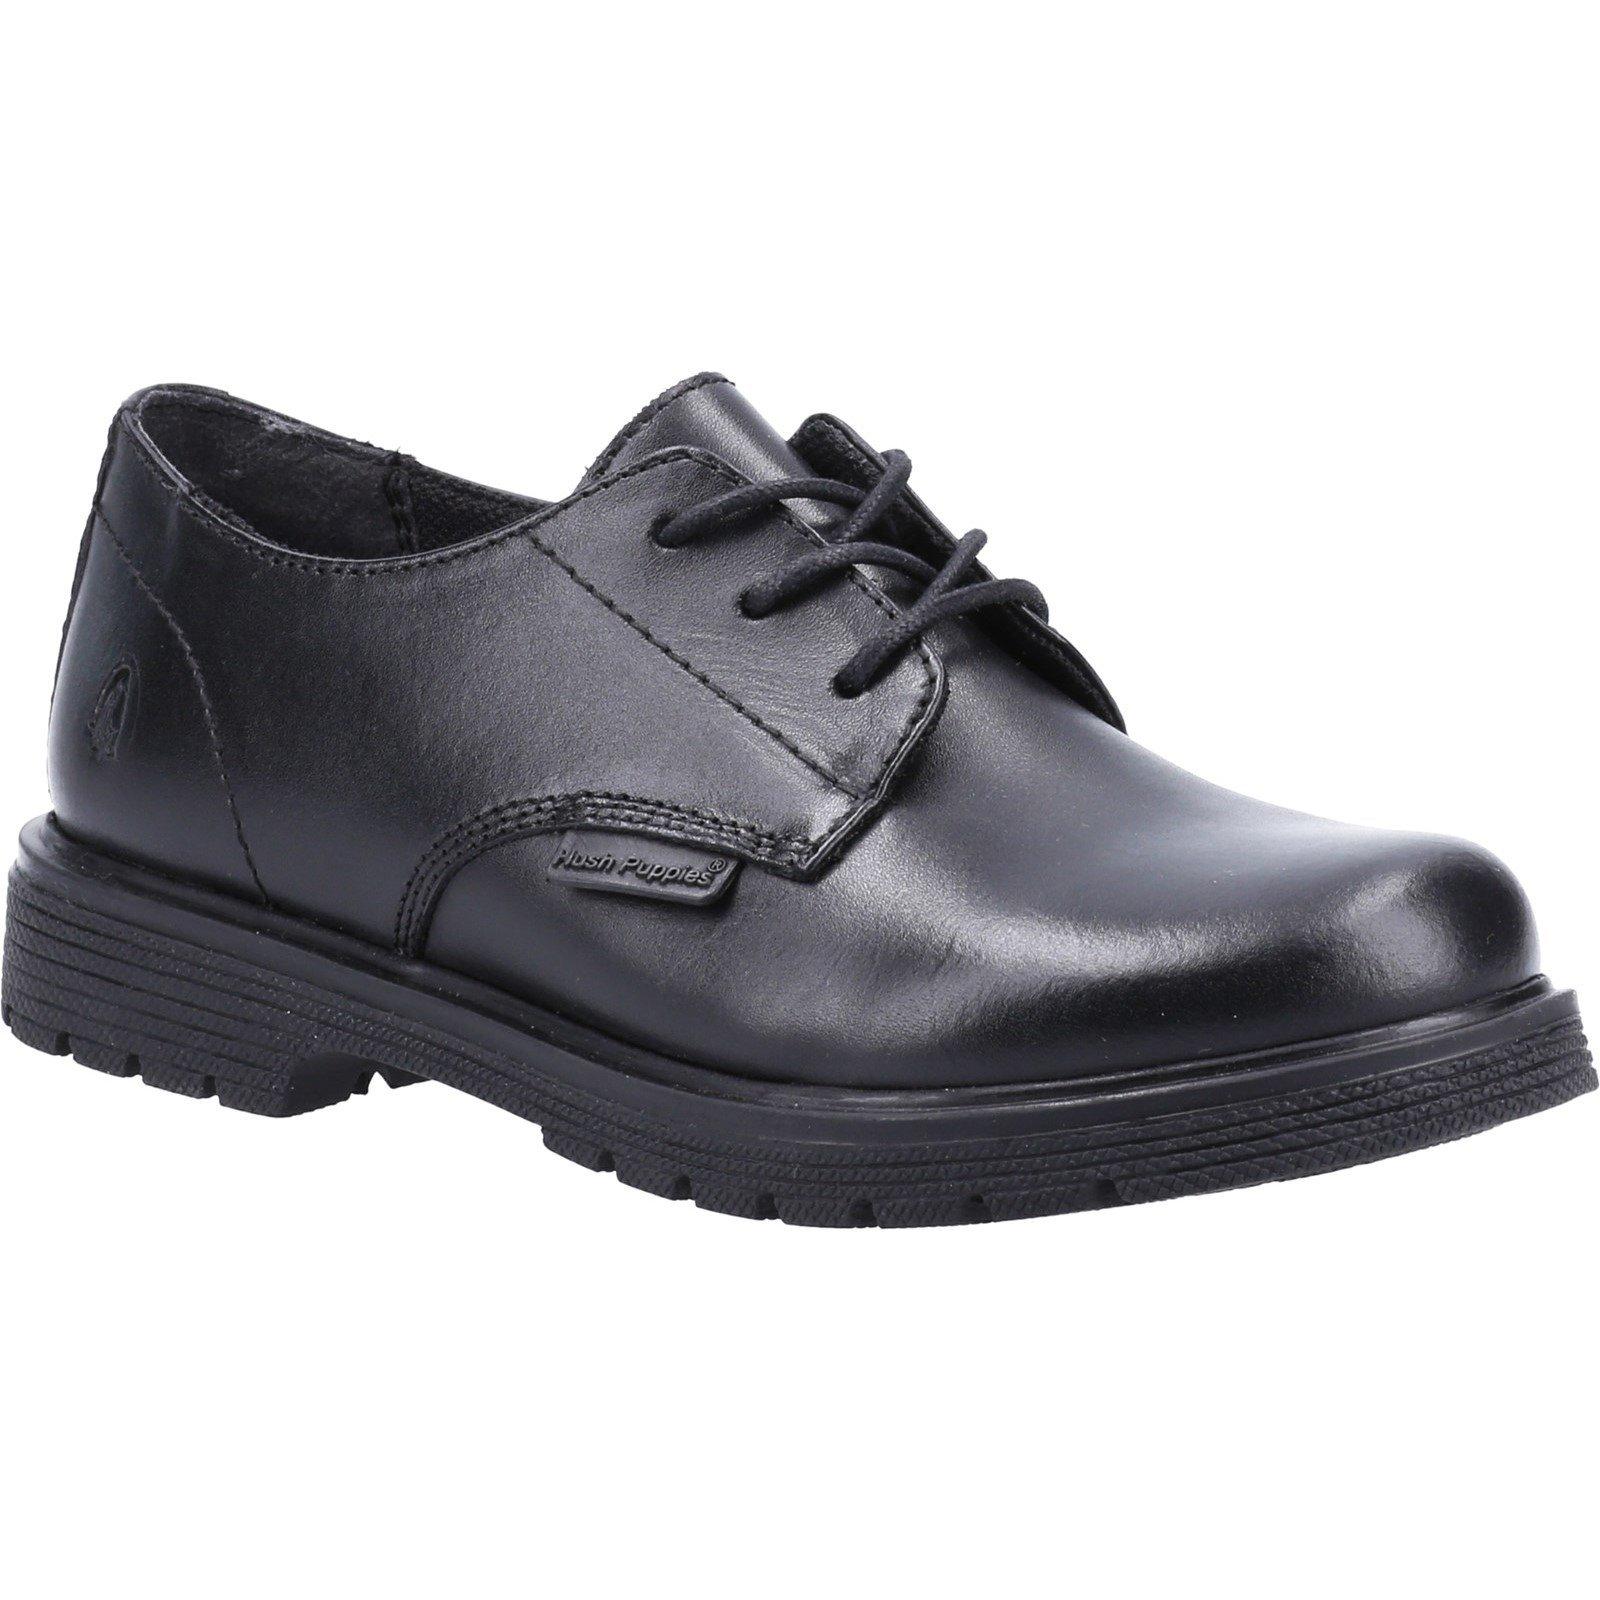 Hush Puppies Kid's Remi Junior School Derby Shoes Black 32612 - Black 11